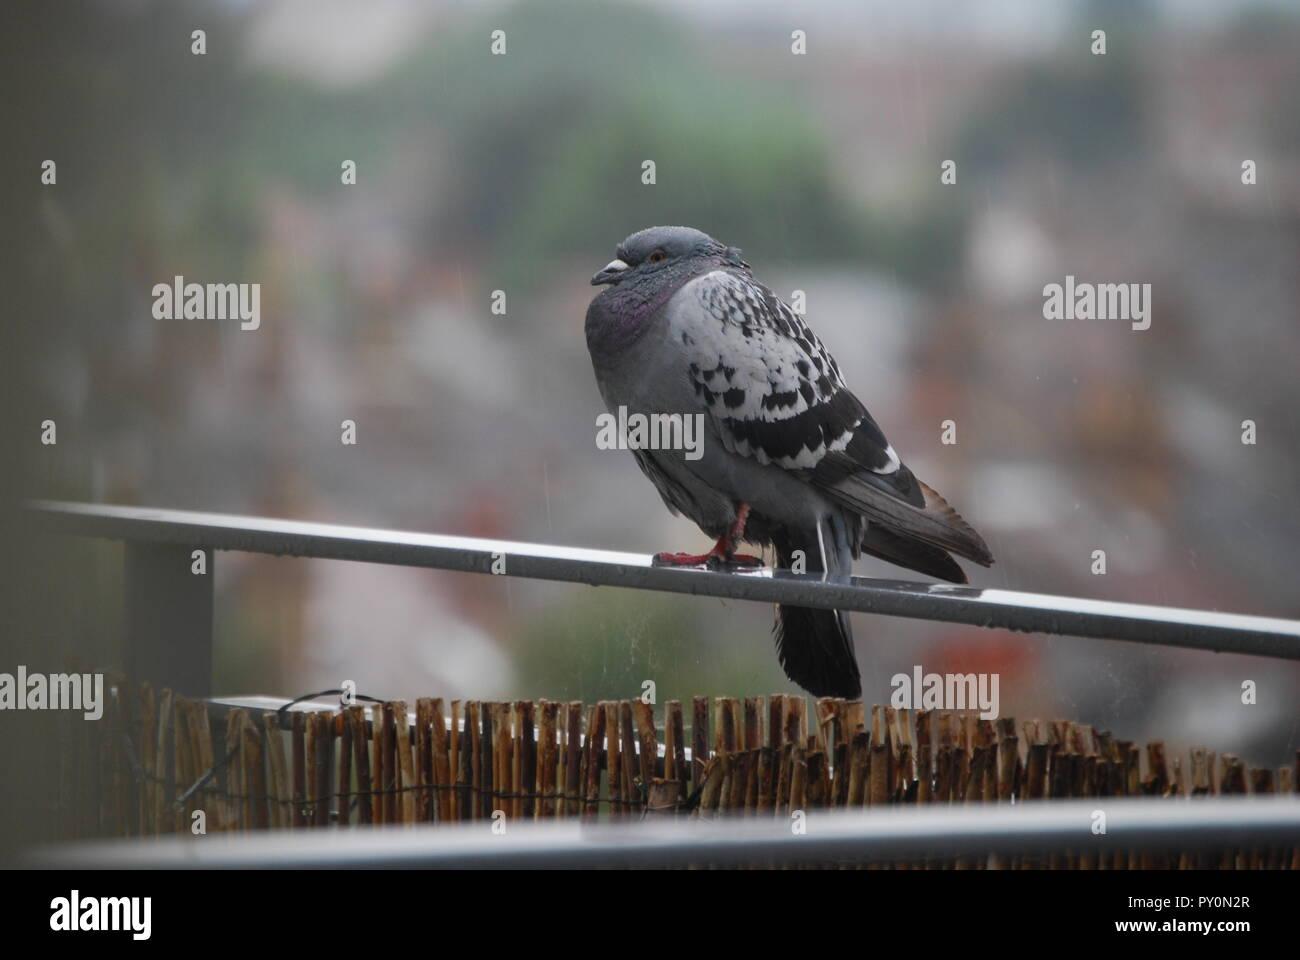 Triste paloma mojada intentando mantener caliente Imagen De Stock